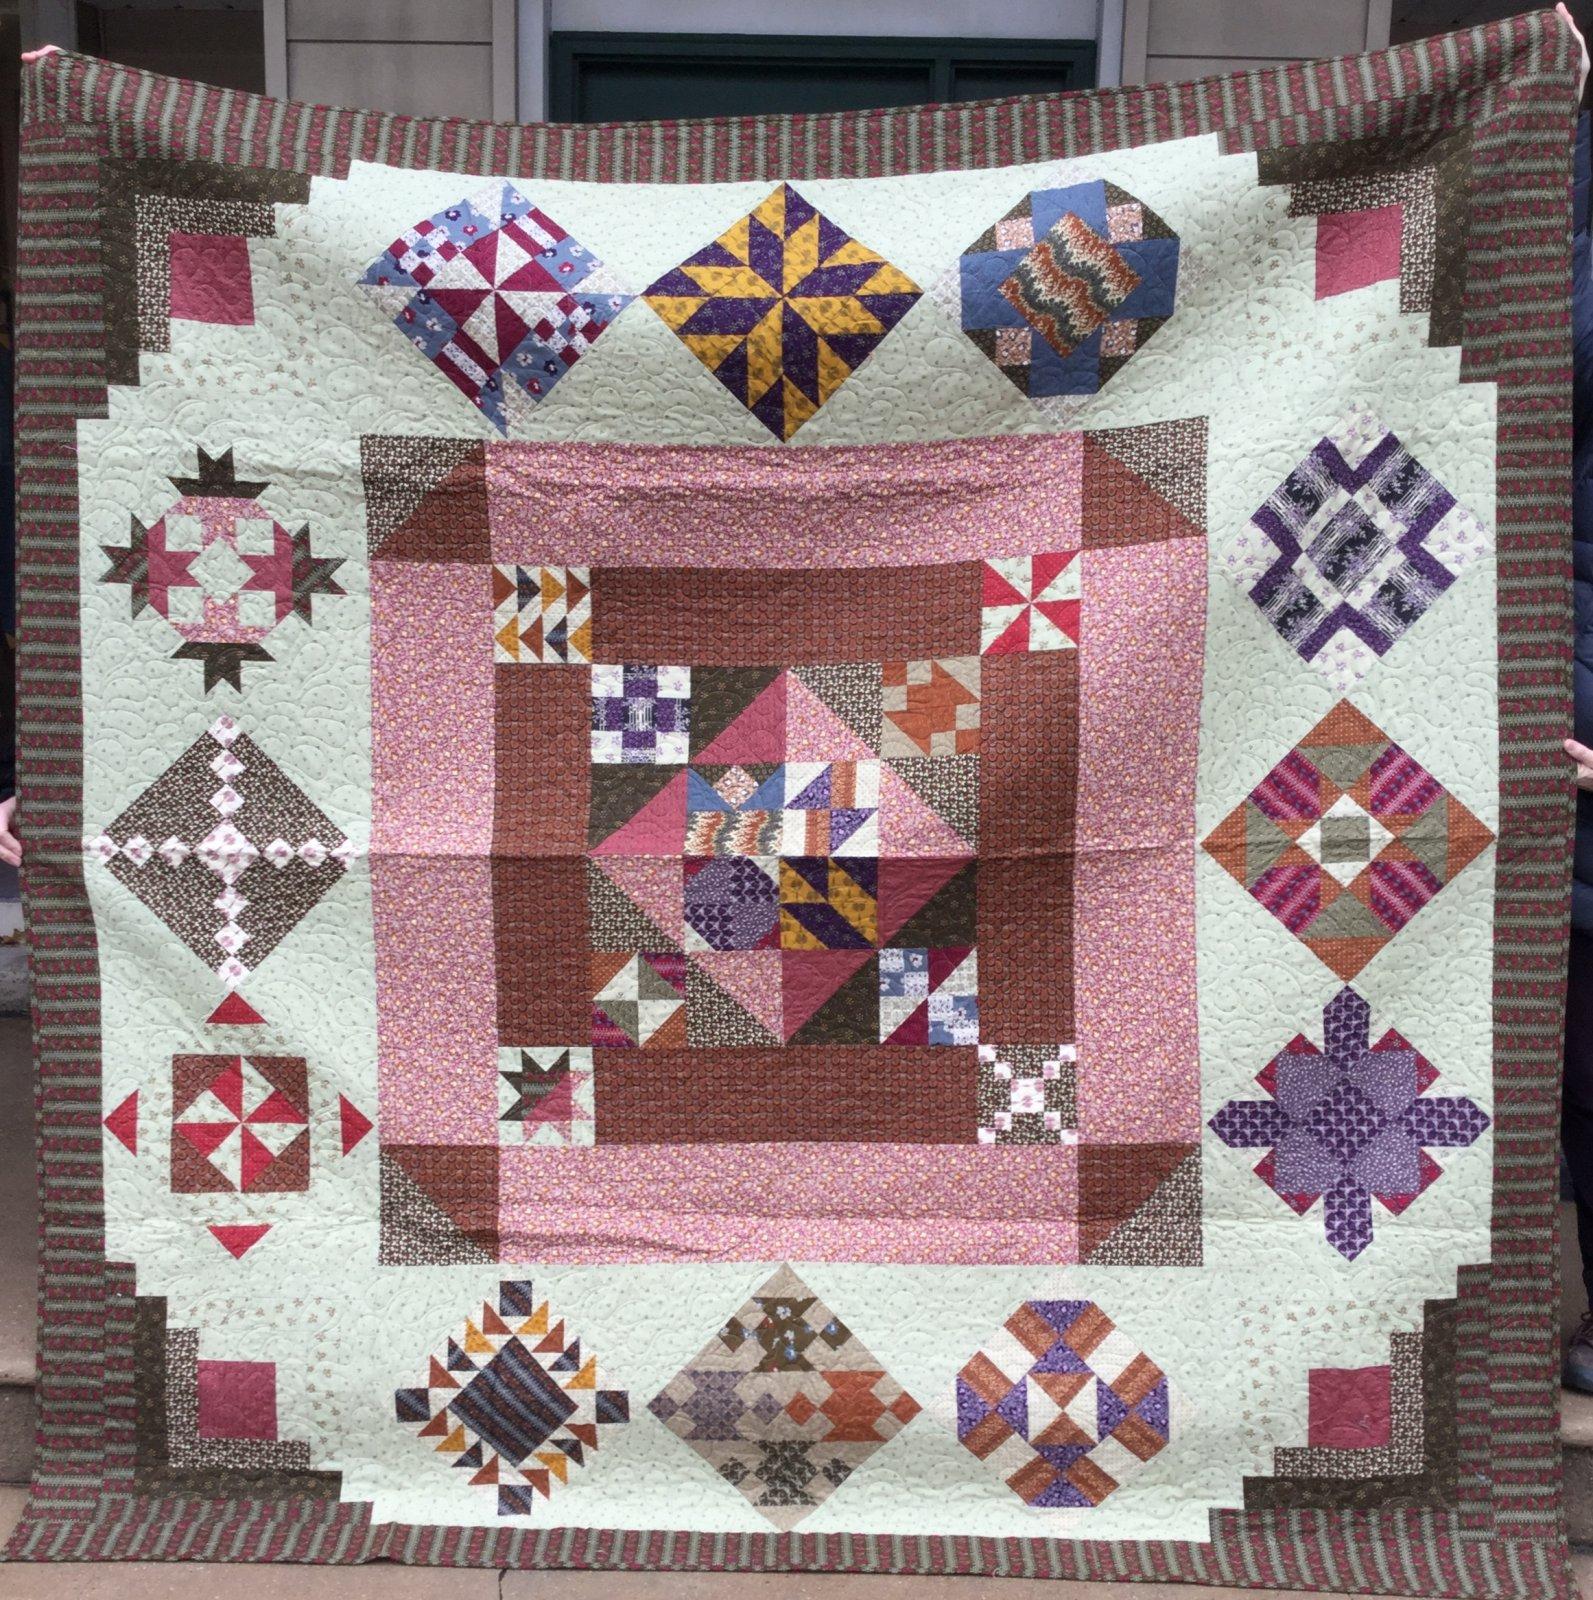 Little Big Quilt (88 x 90)